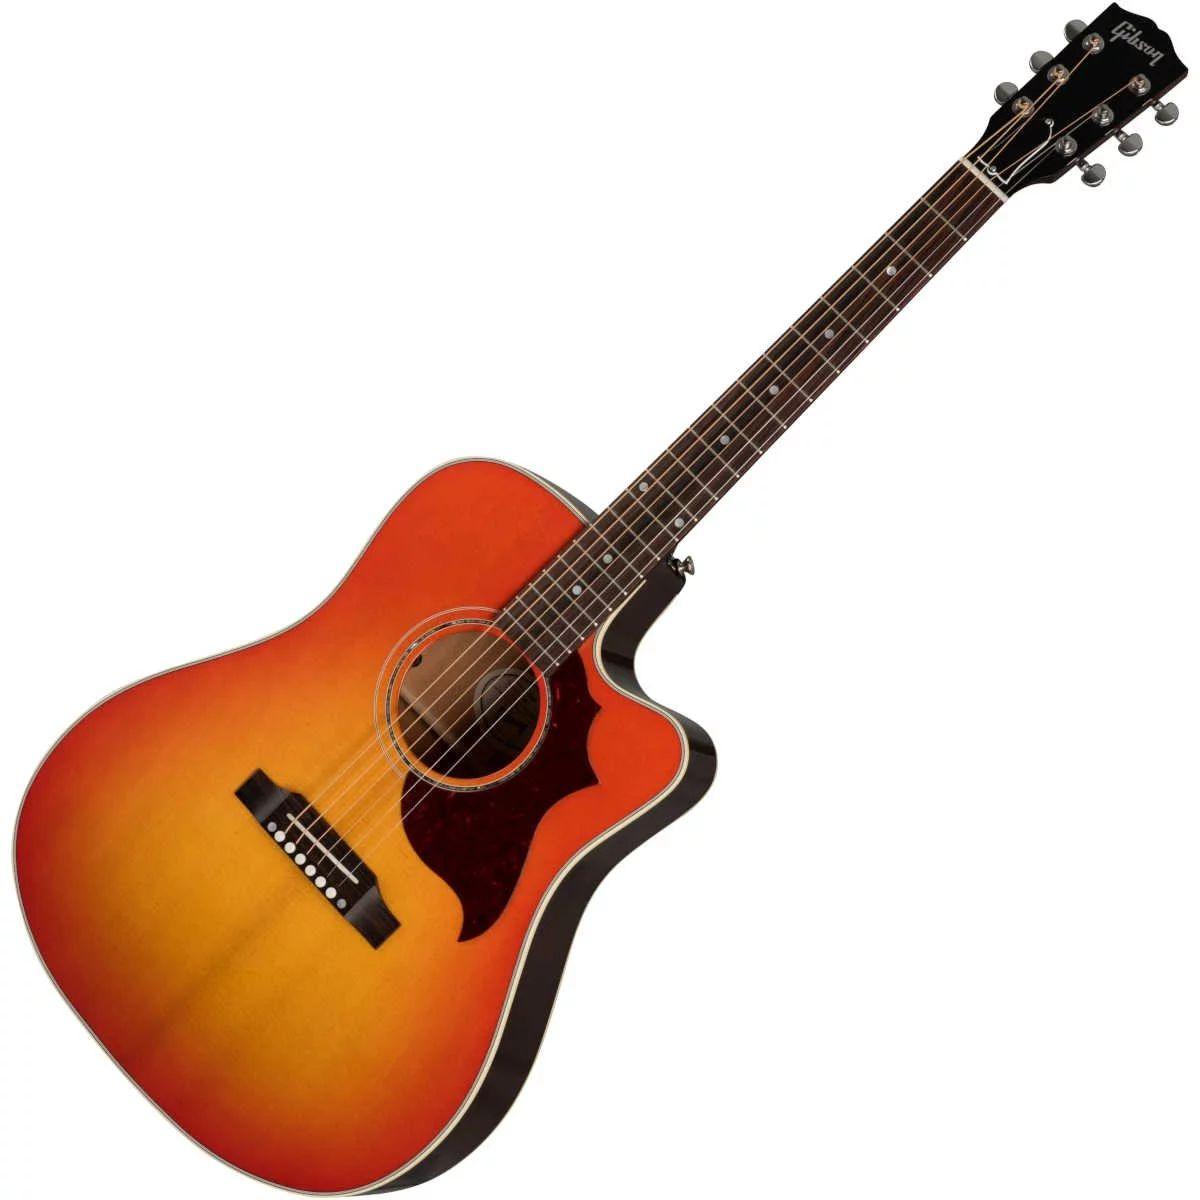 Gibson usa 2019 hummingbird mahogany avant garde - light cherry burst £1439.10 @ Dawsons music